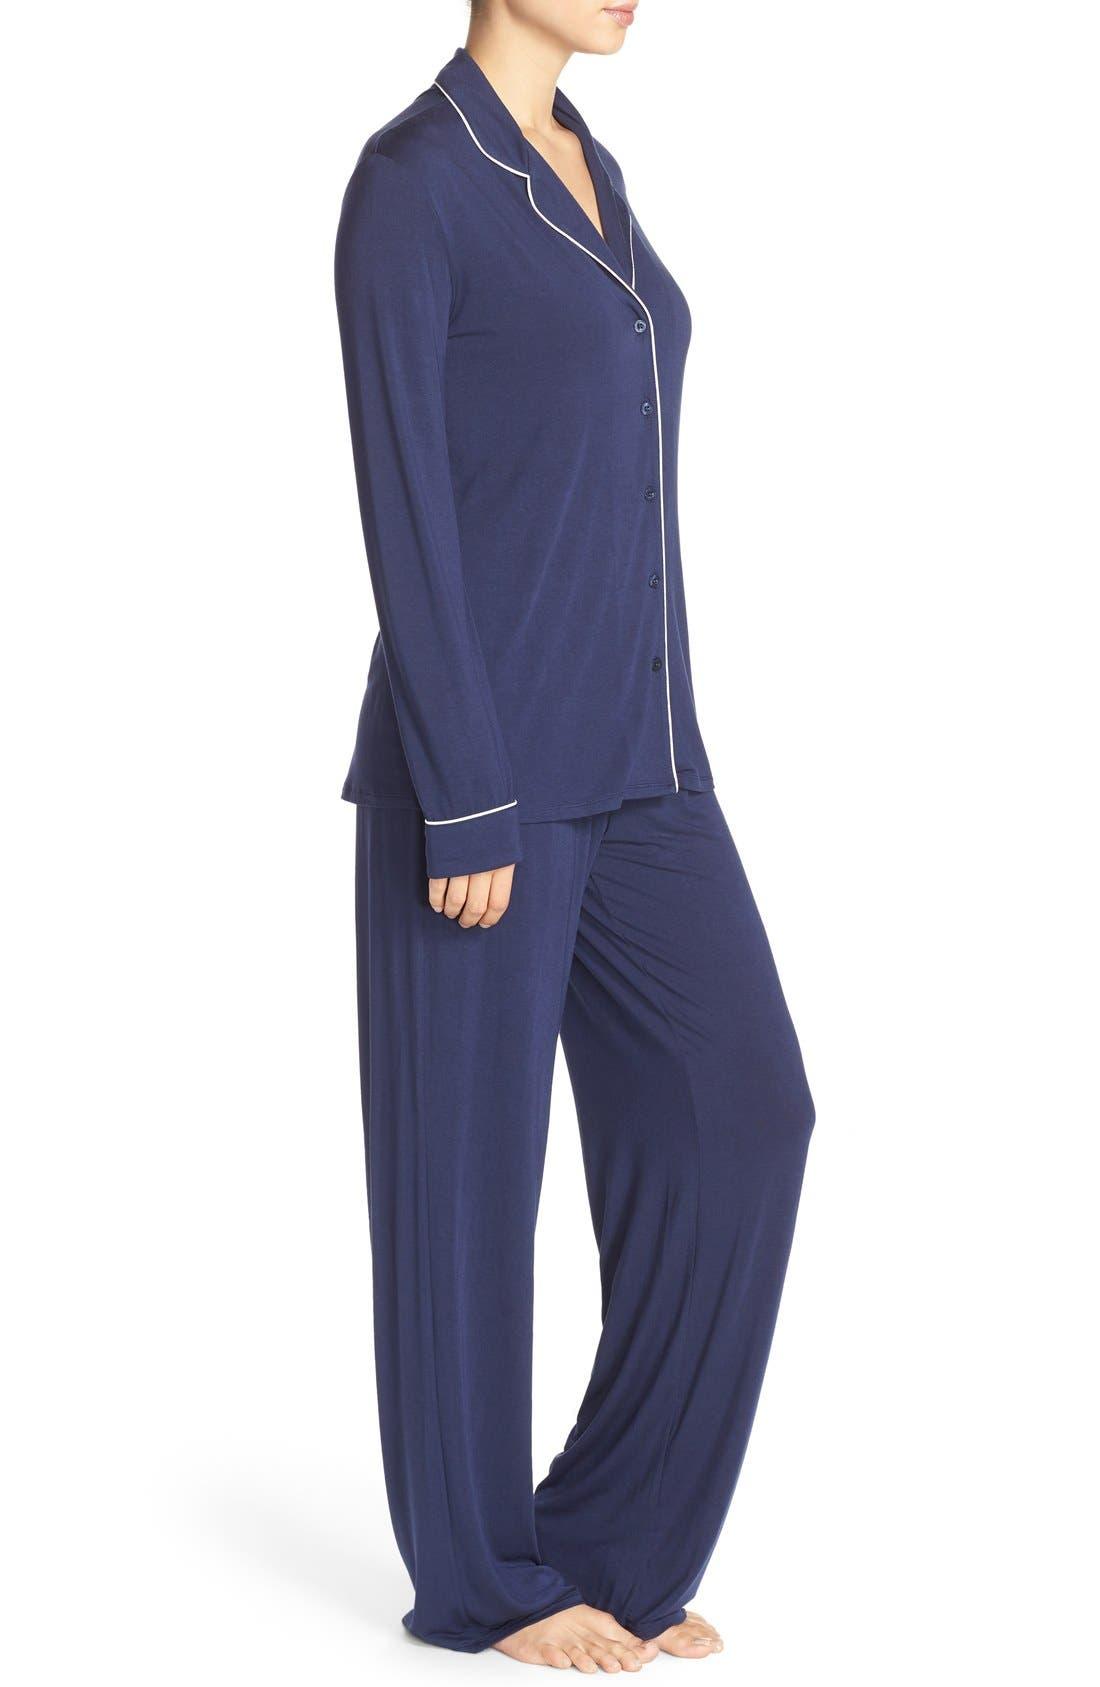 Moonlight Pajamas,                             Alternate thumbnail 3, color,                             Navy Peacoat